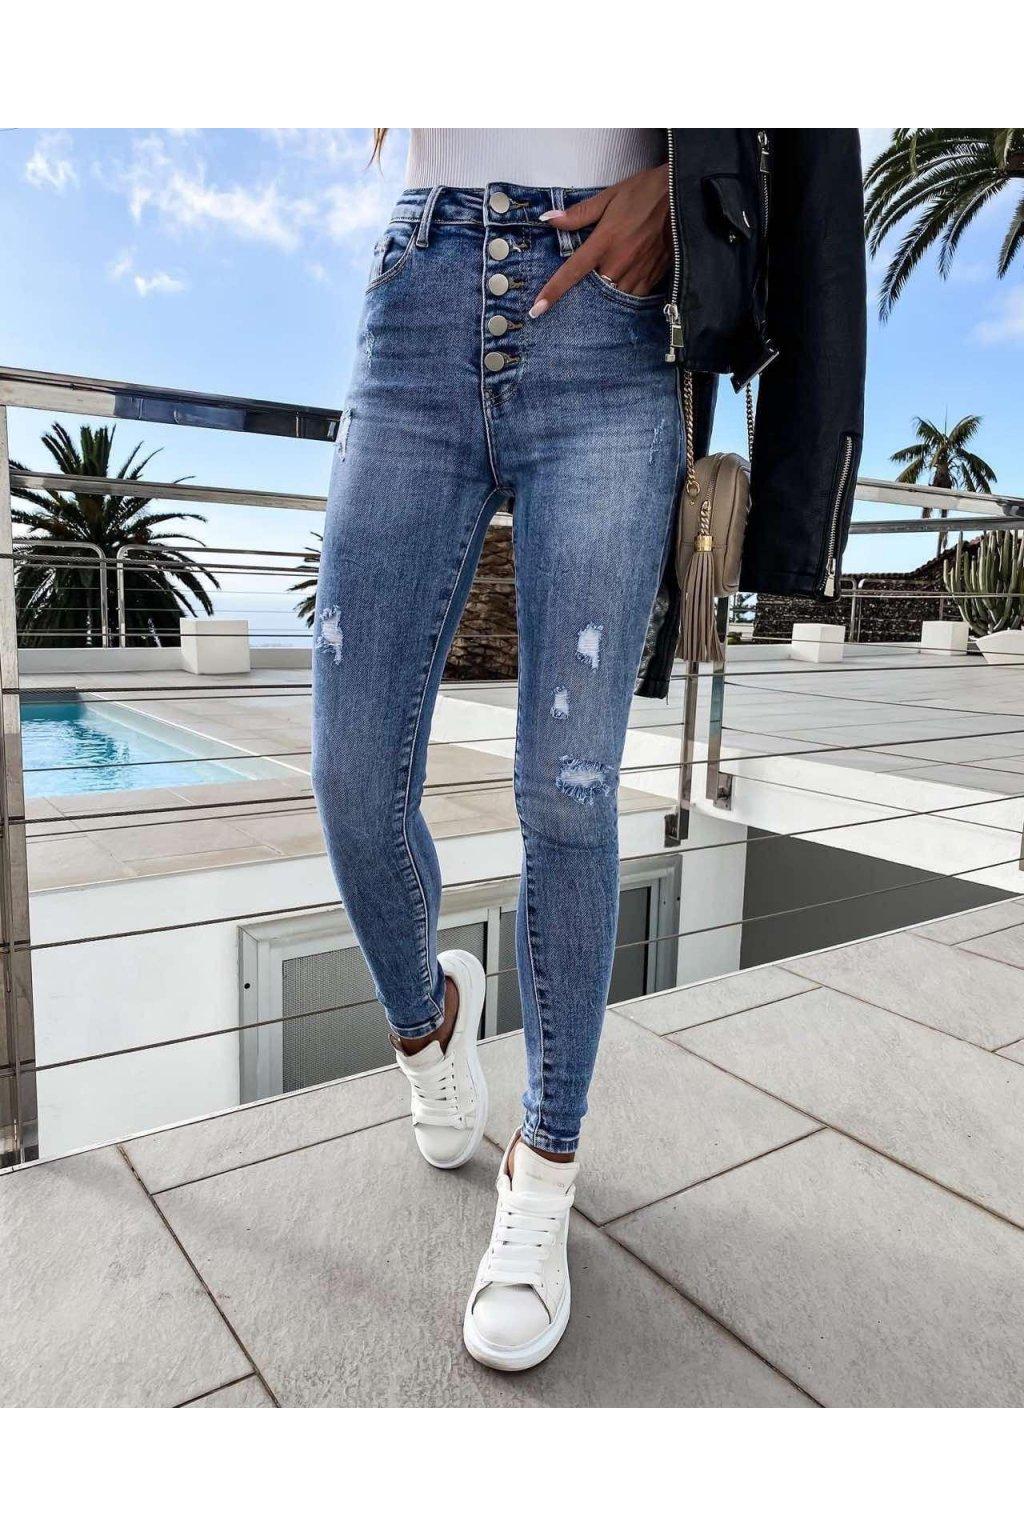 jeans trendy knoflíček modré s elastanem